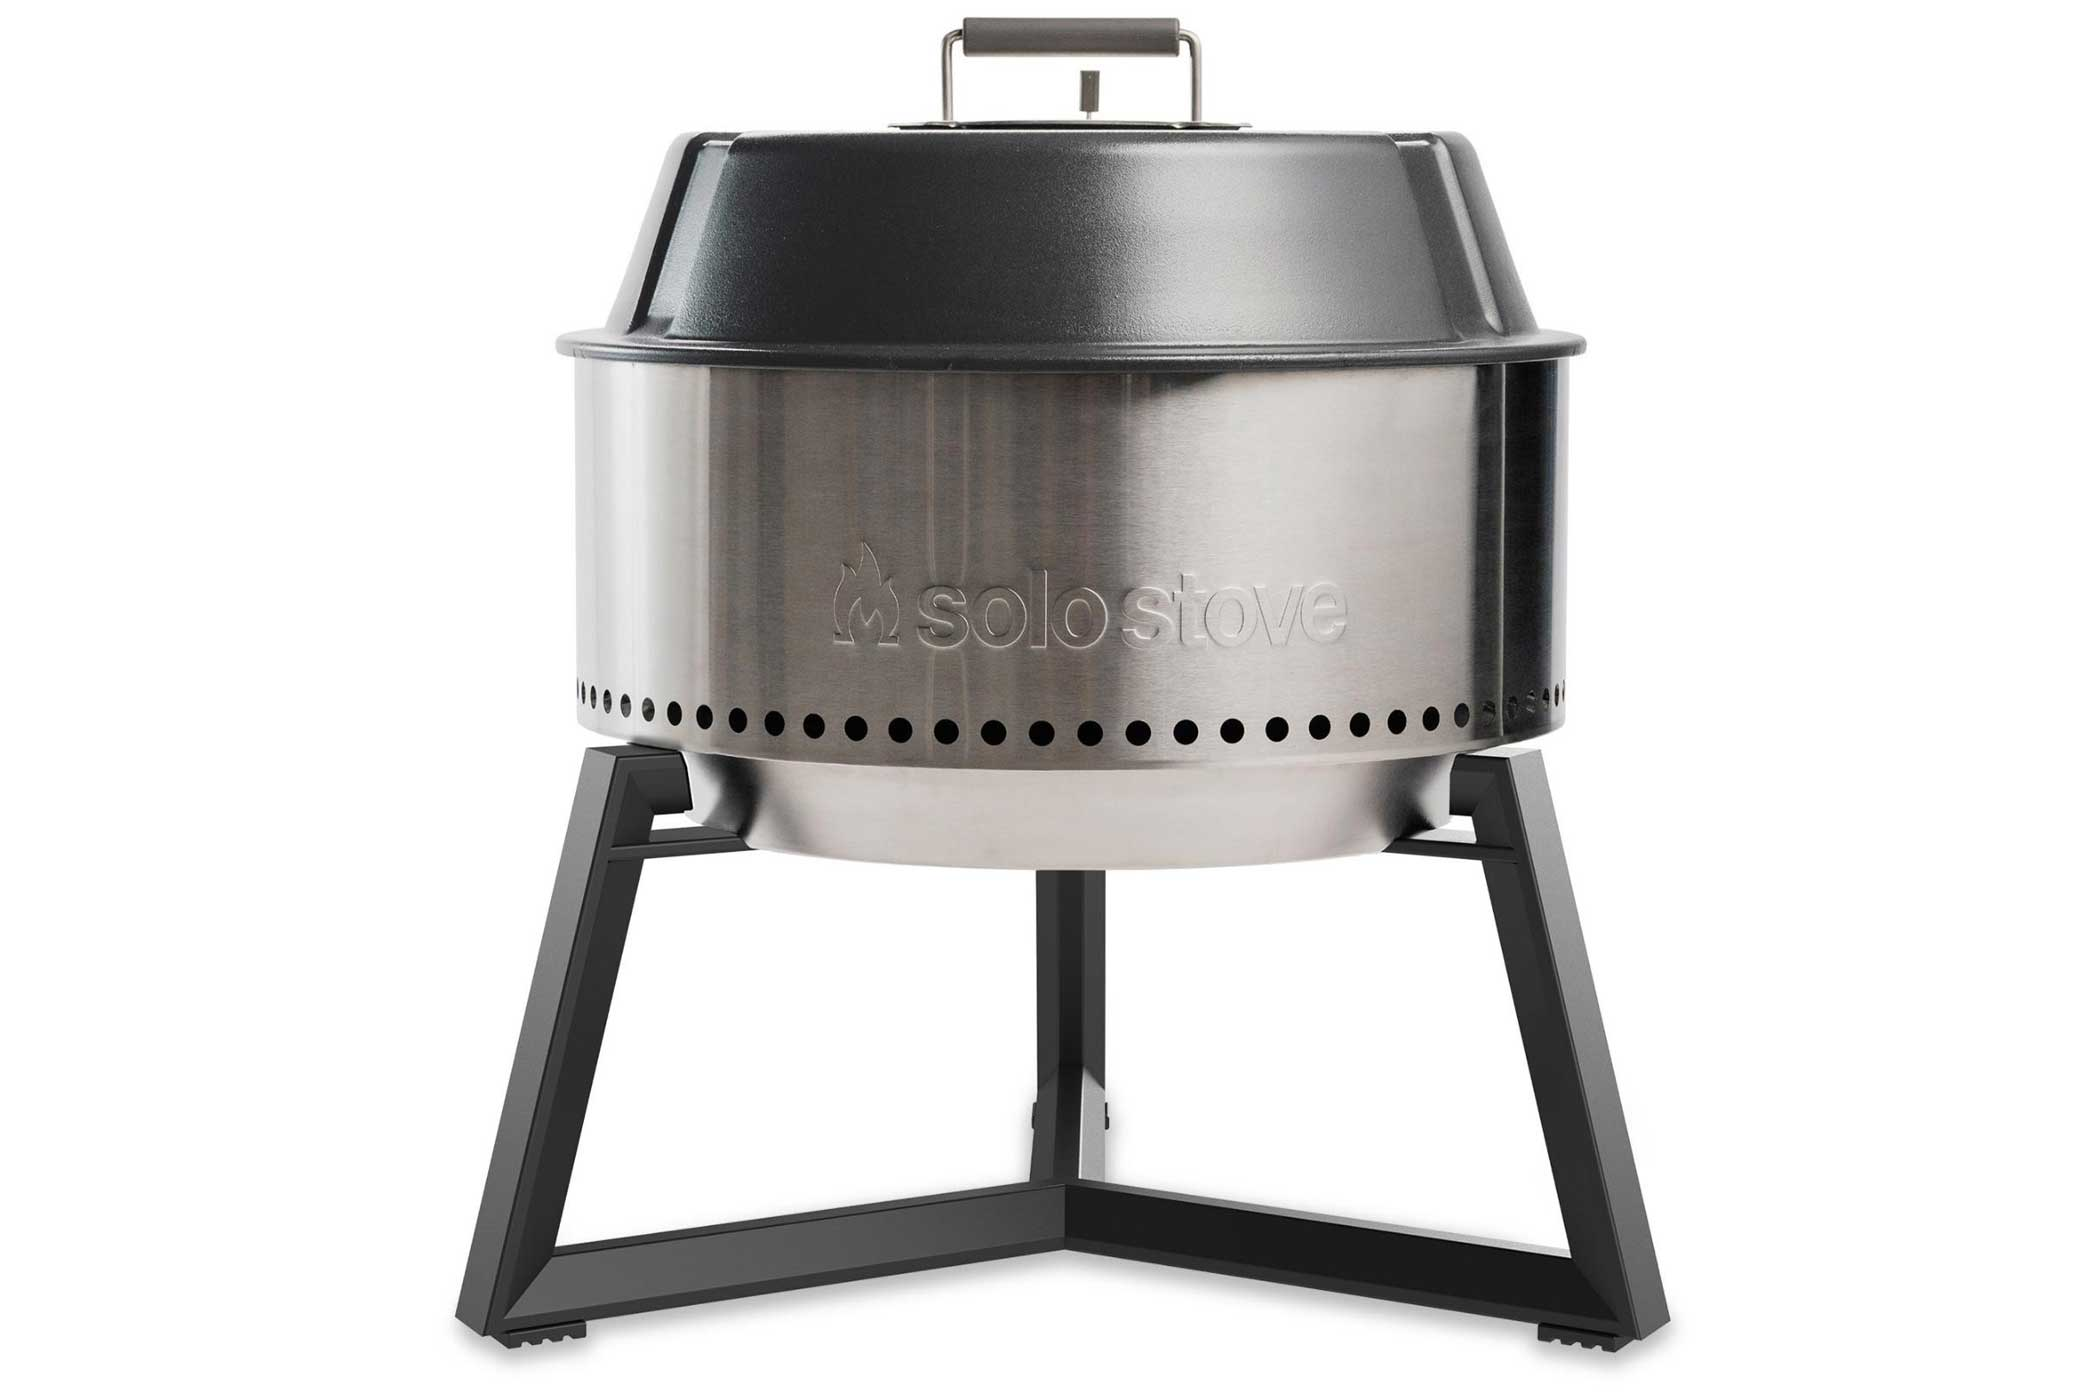 solo stove grill bundle